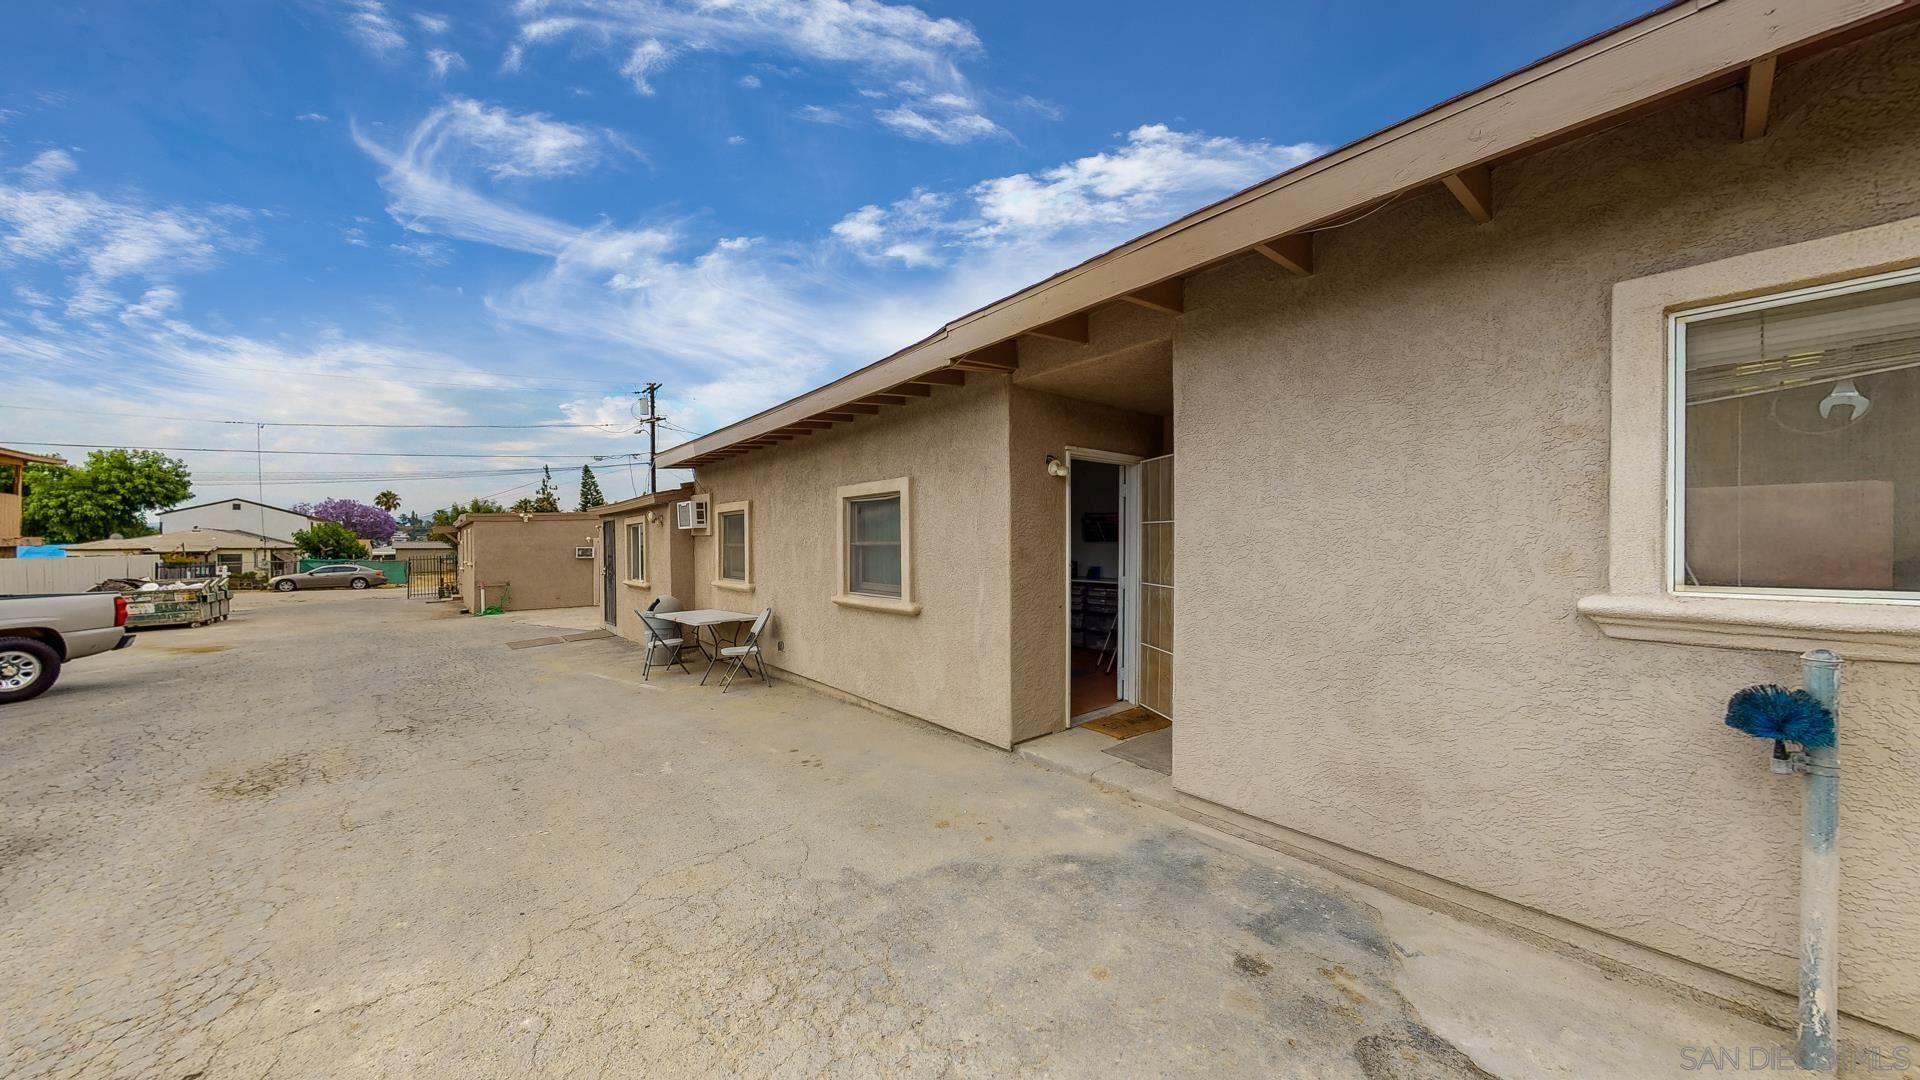 Photo of 12030 Short St, Lakeside, CA 92040 (MLS # 210021142)